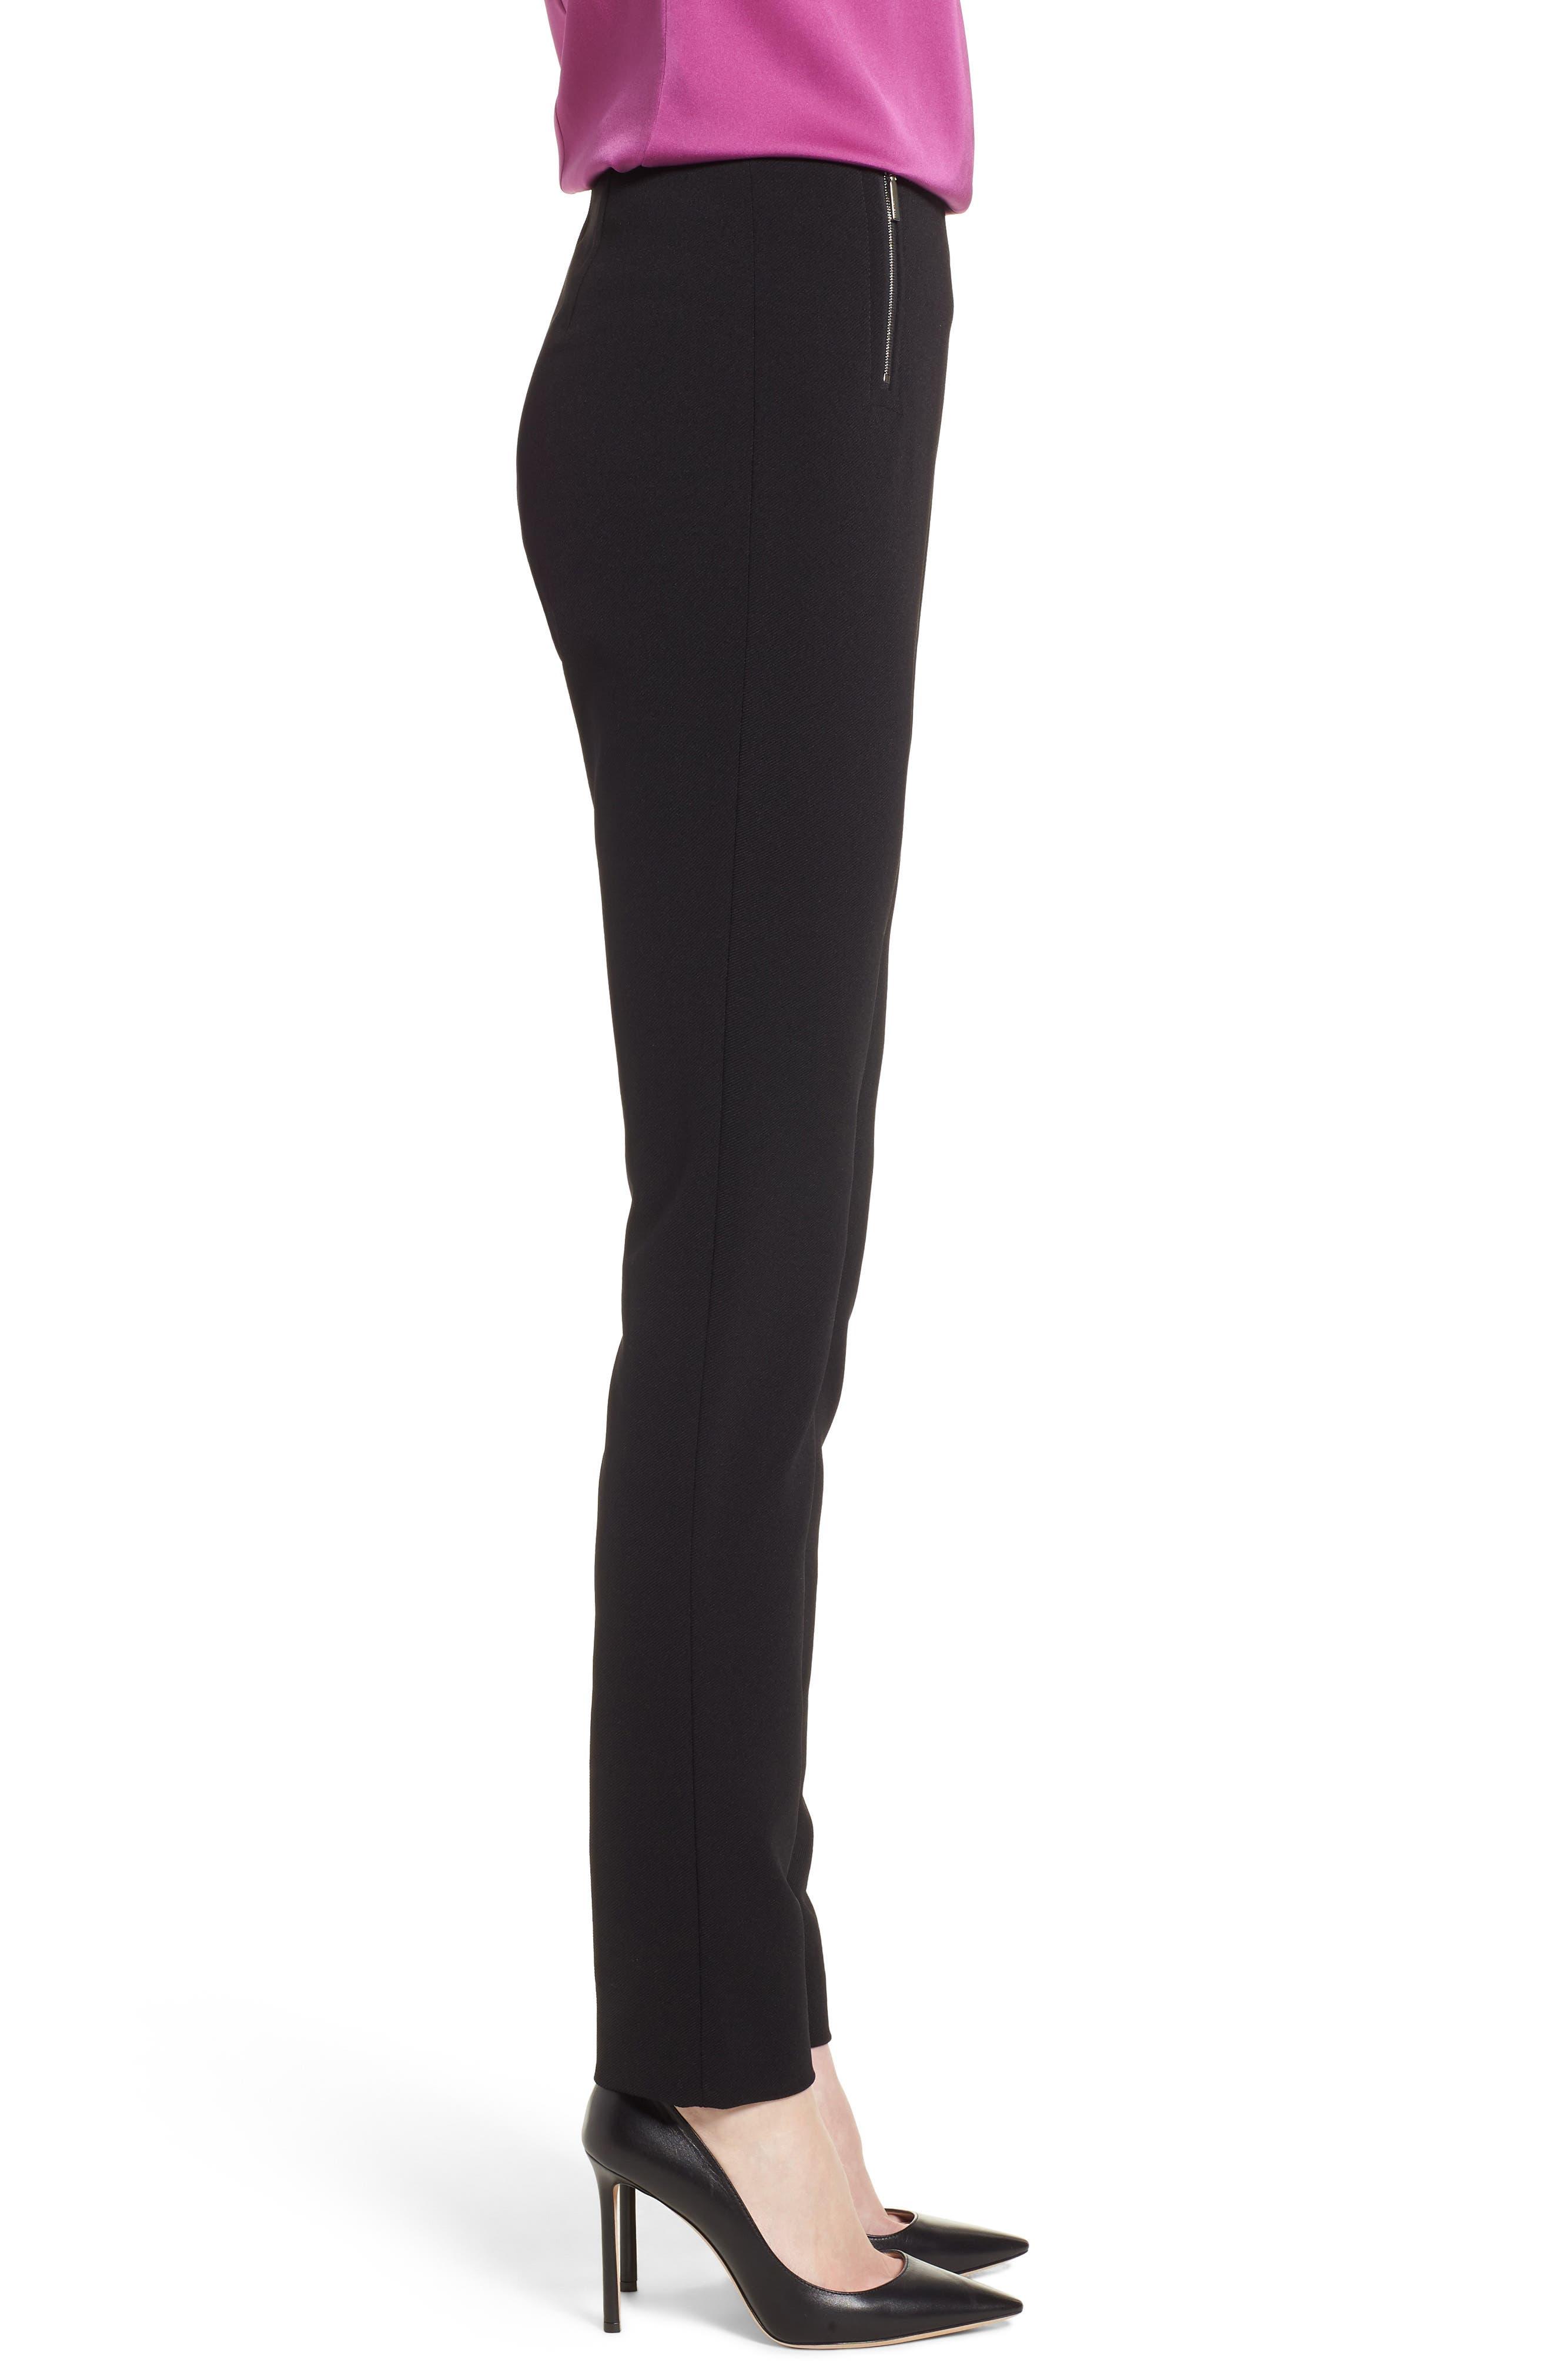 Tilezea Twill Jersey Trousers,                             Alternate thumbnail 3, color,                             Black